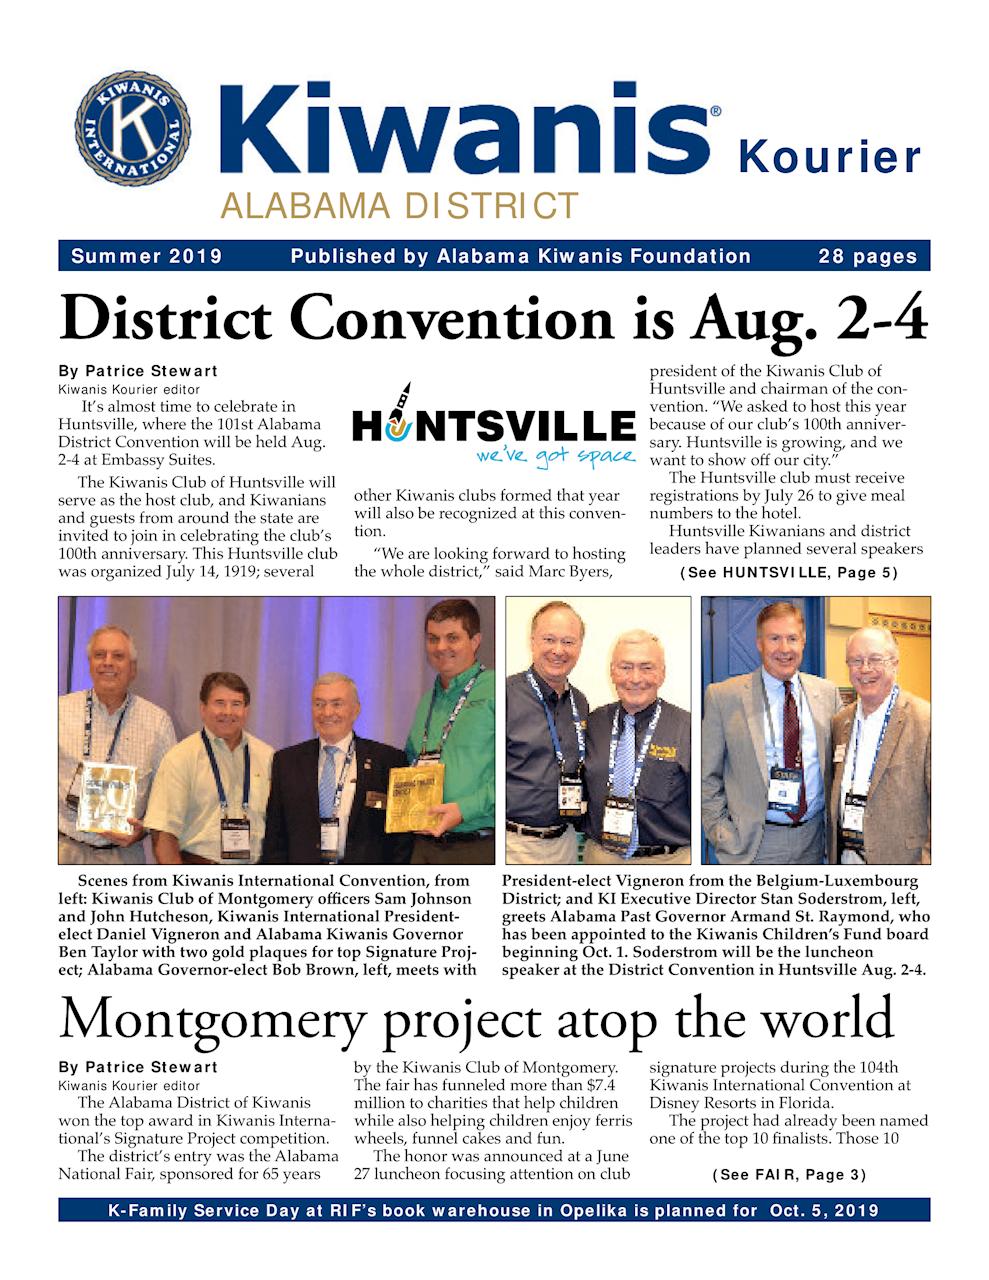 Alabama - Kiwanis International